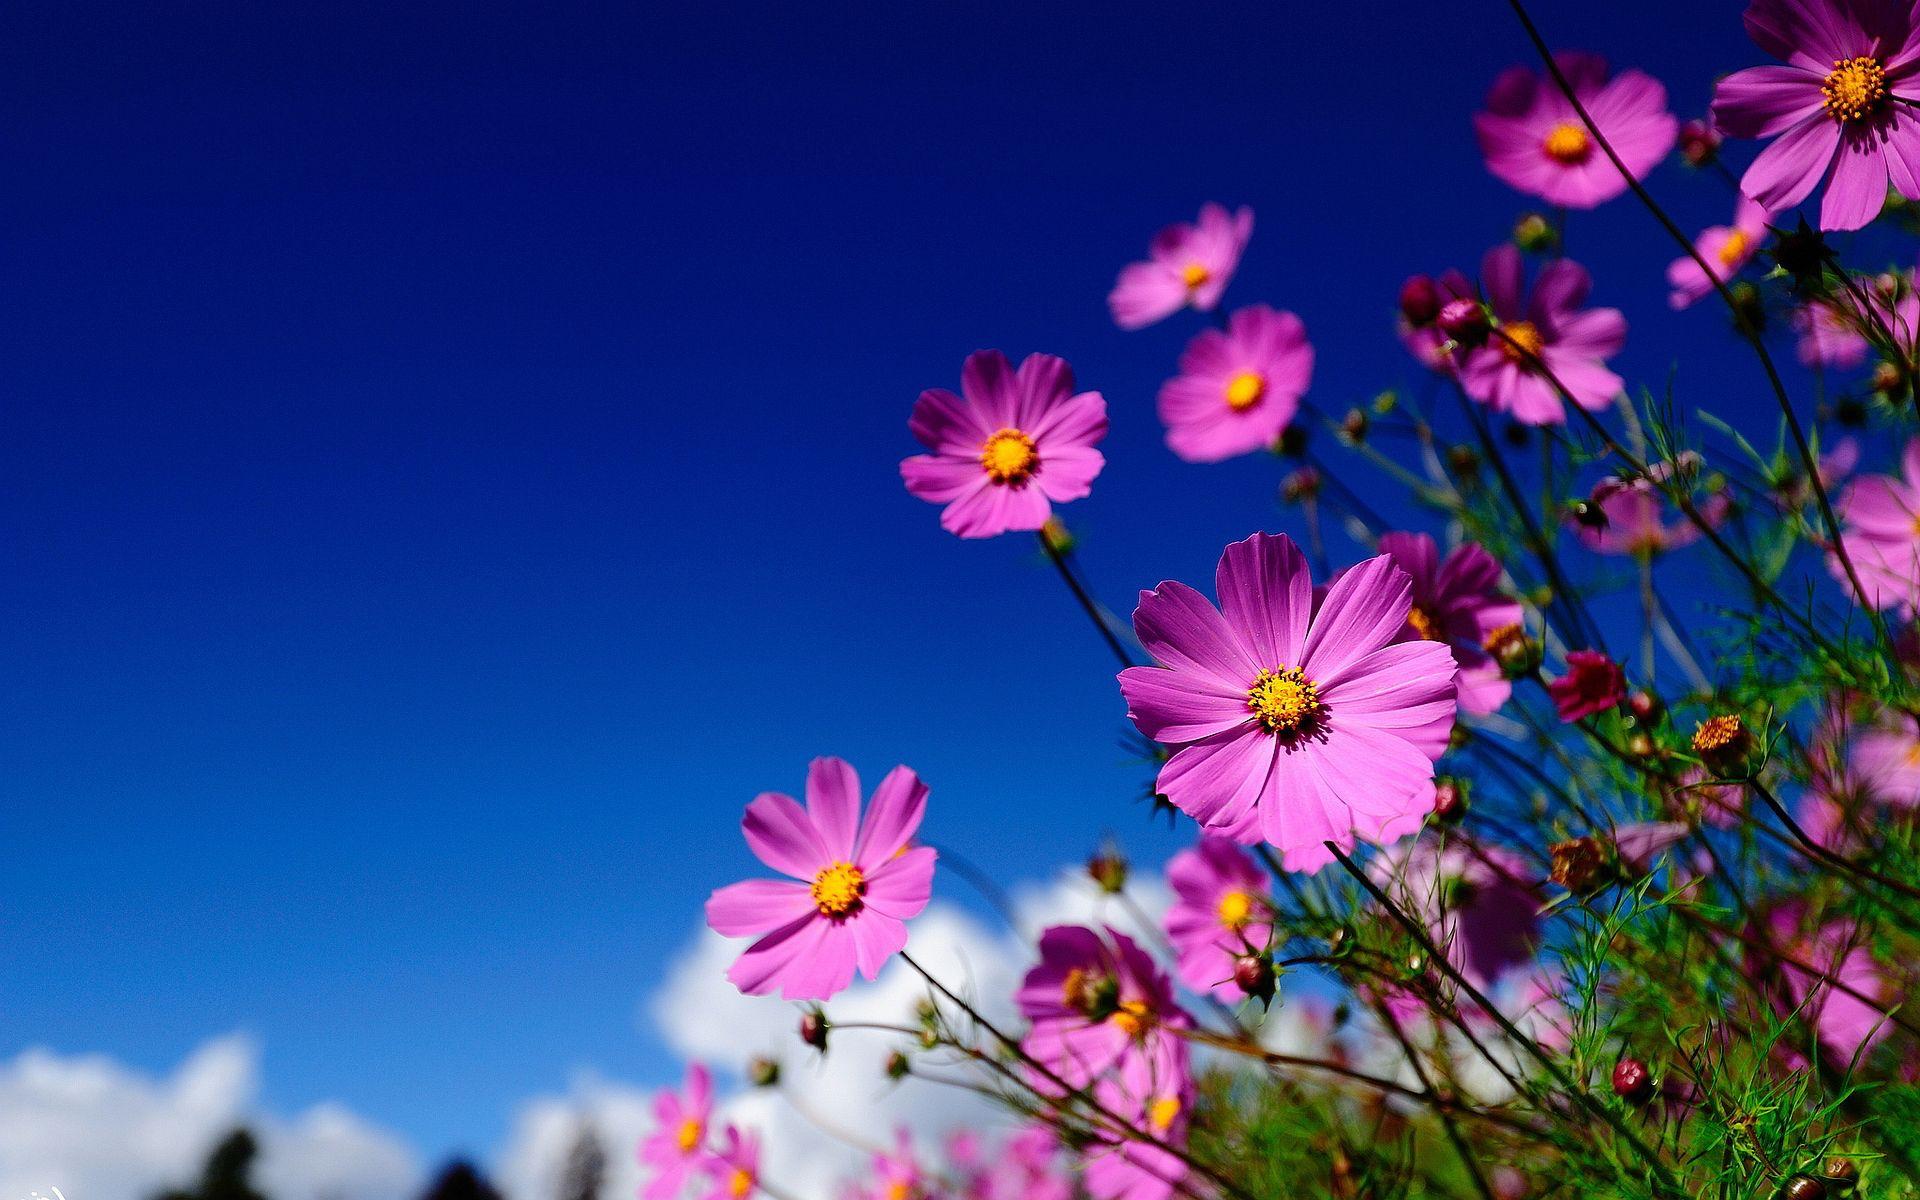 Pink Flowers Meadow Flowers Meadow Flower Wallpaper Meadow Wallpaper Coolest bell flower wallpaper